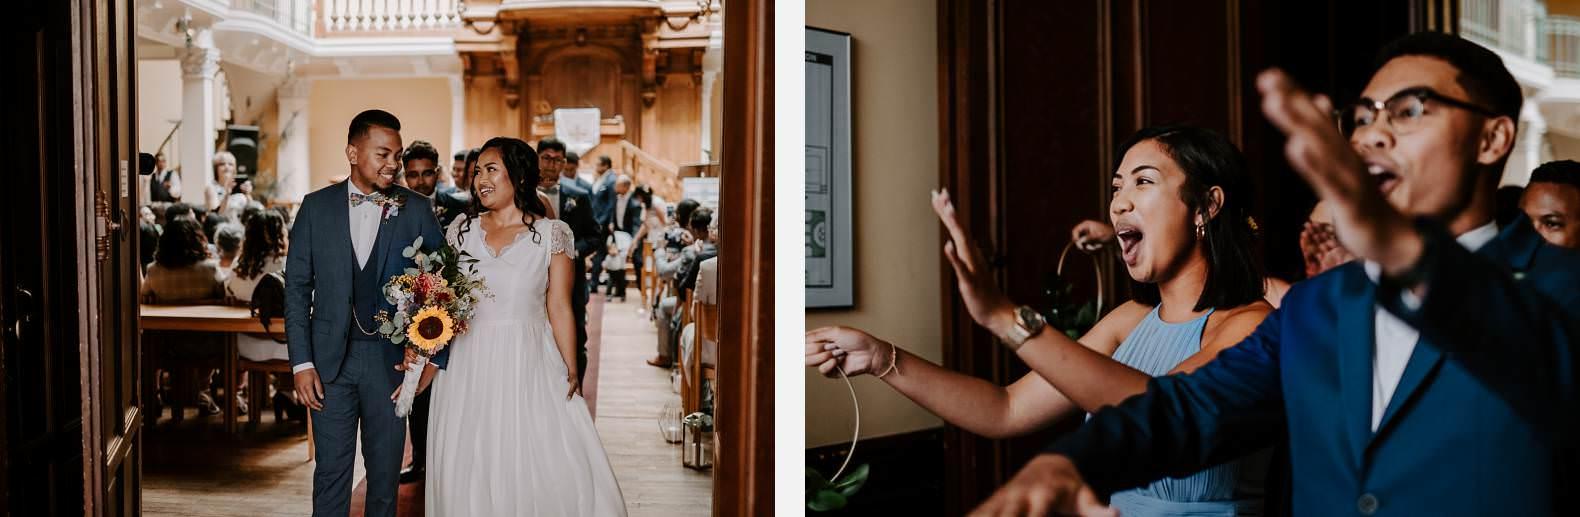 mariage manoir de corny photographe bel esprit 0033 1